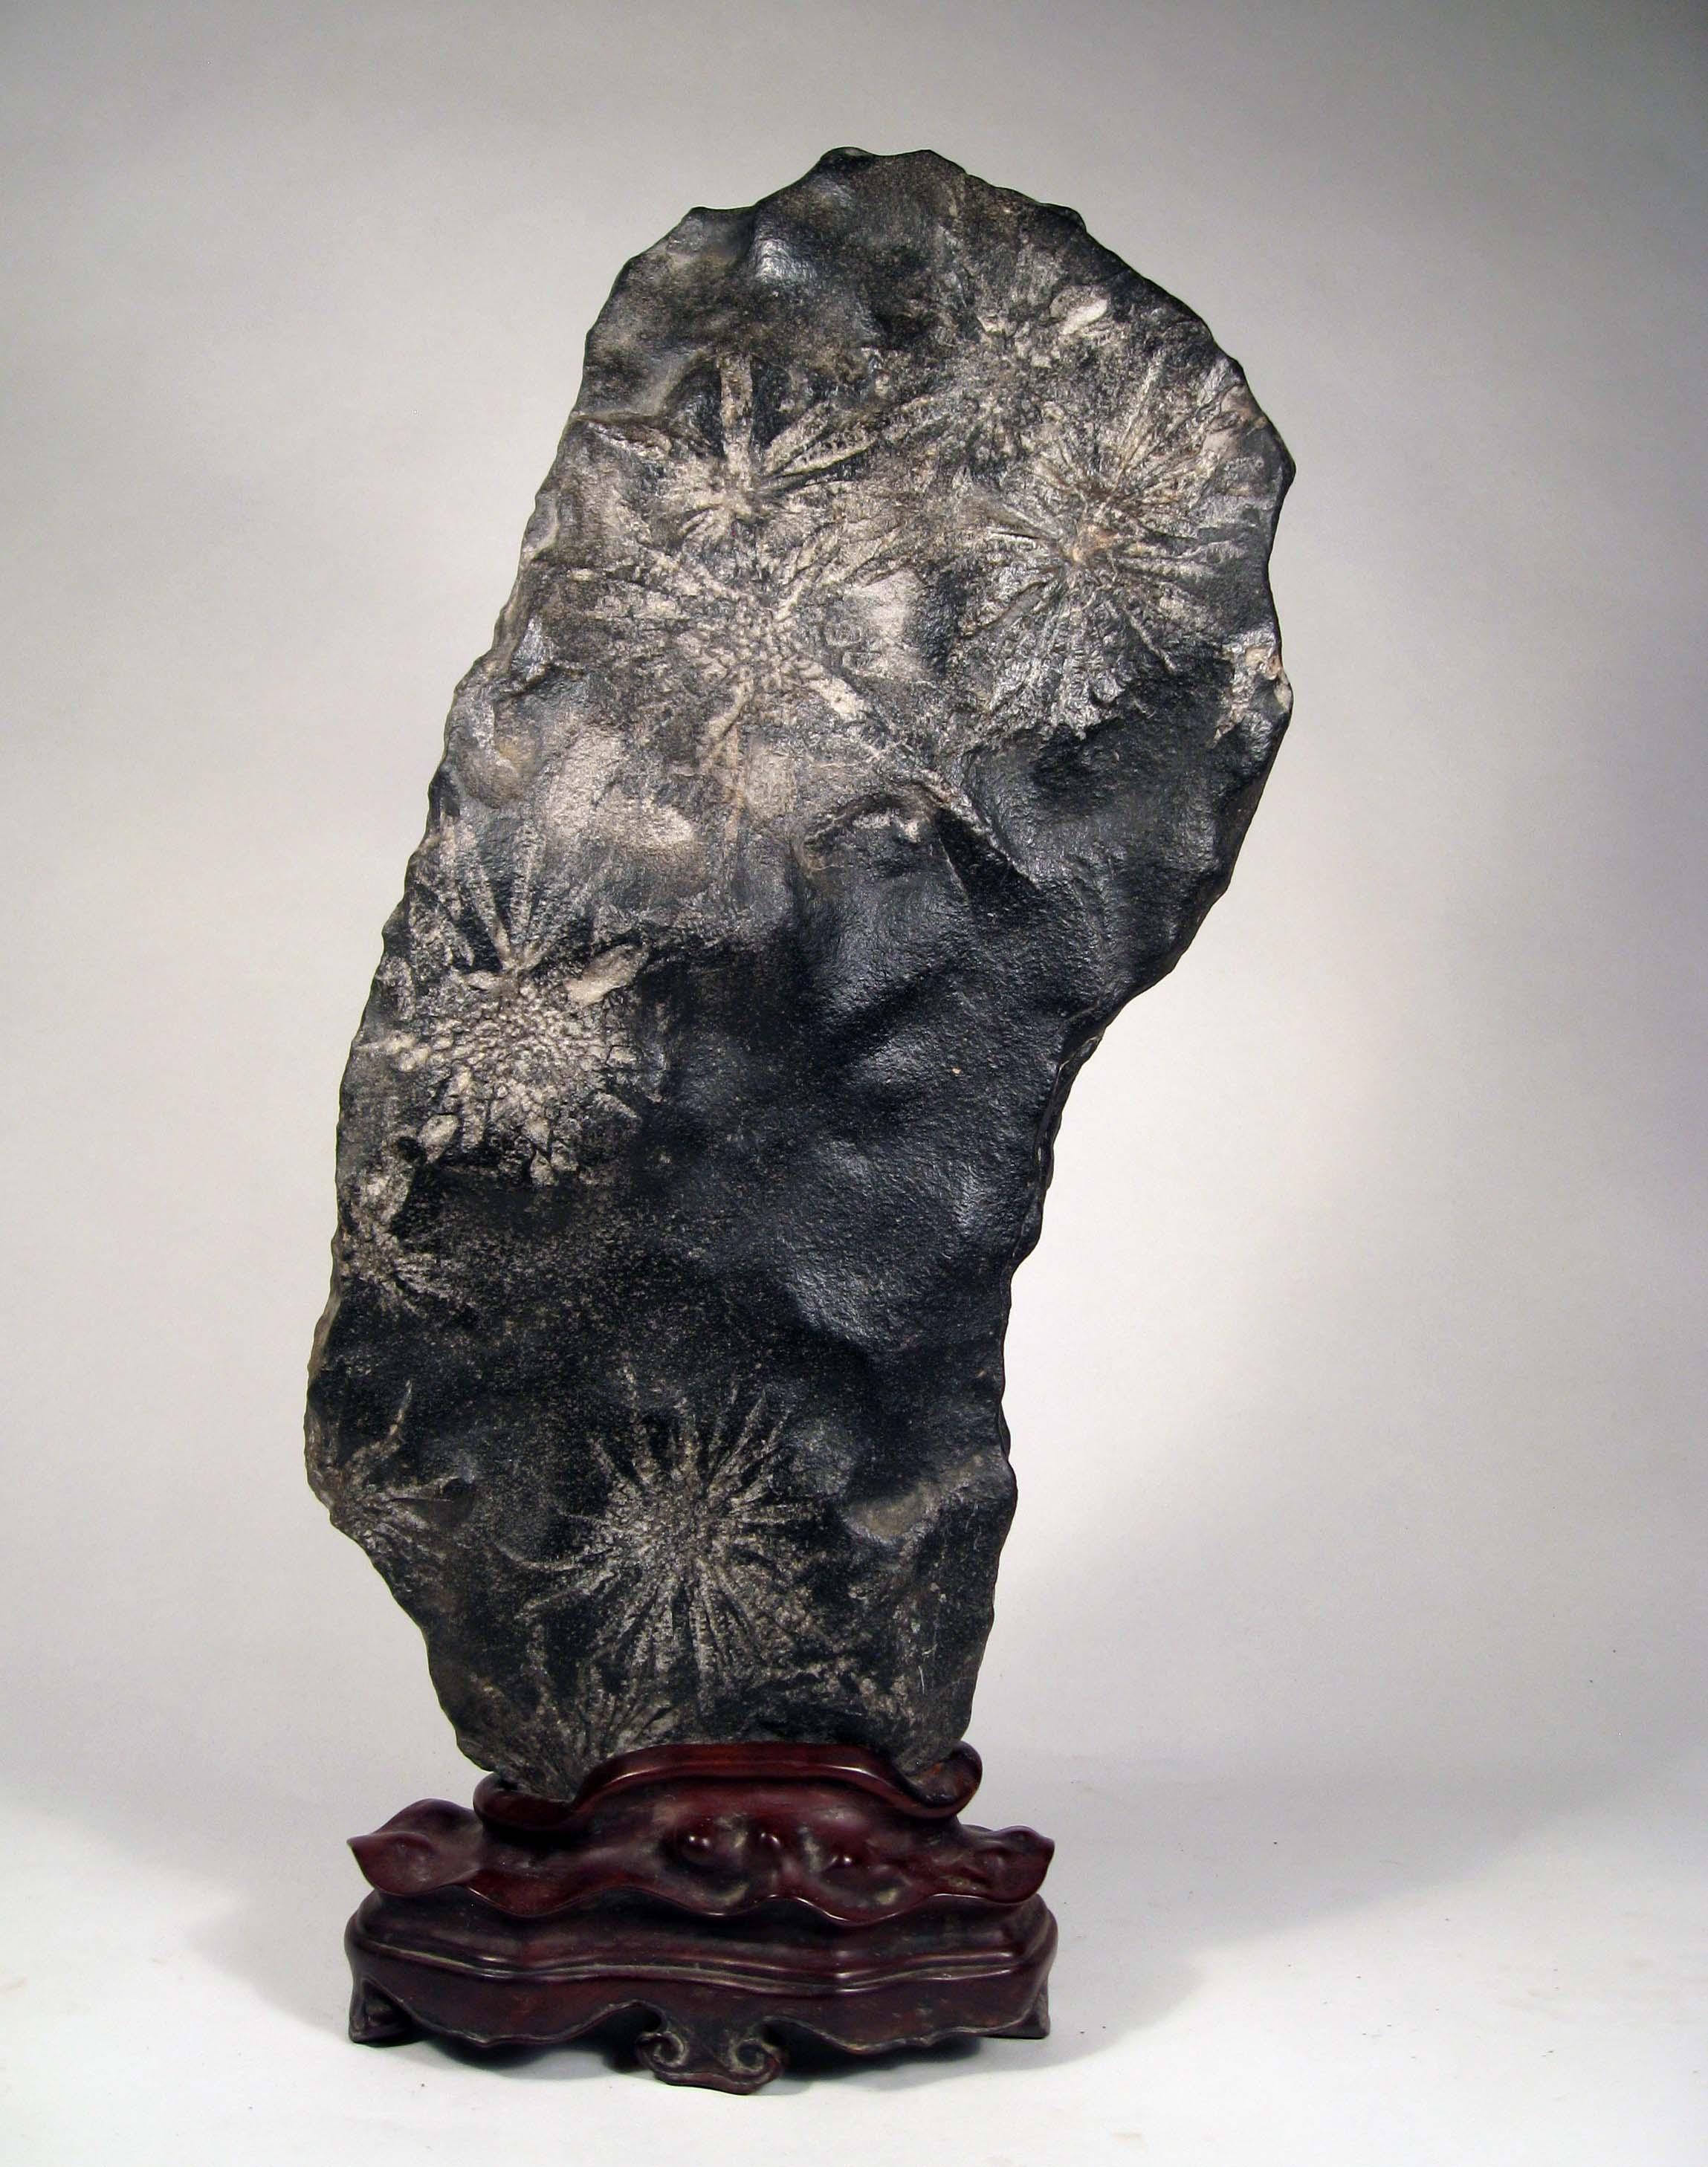 S07 Chrysanthum Stone 39x20x8 cm